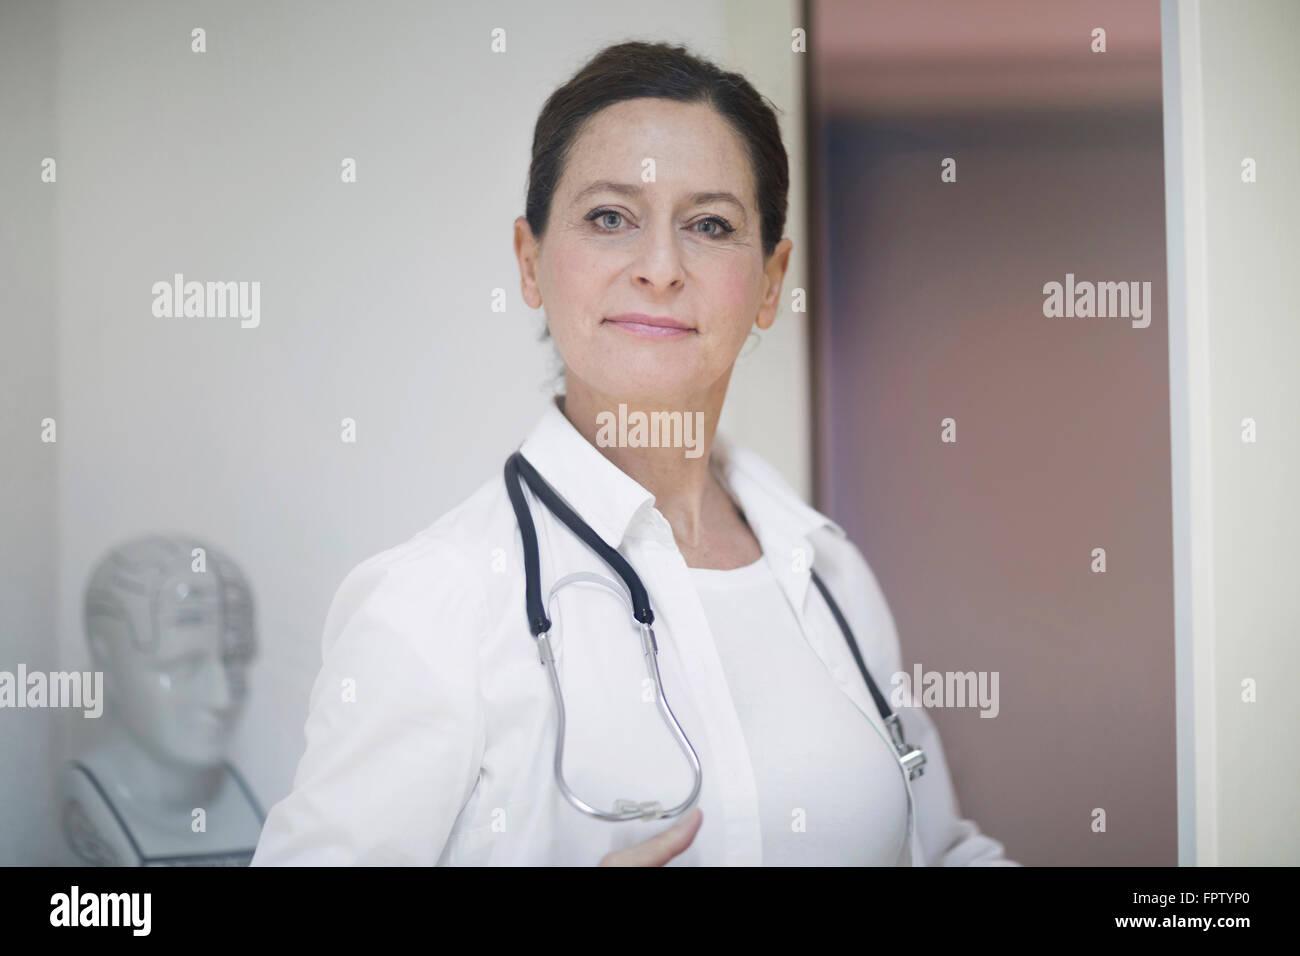 Portrait of a confident female doctor with stethoscope, Freiburg Im Breisgau, Baden-Württemberg, Germany - Stock Image